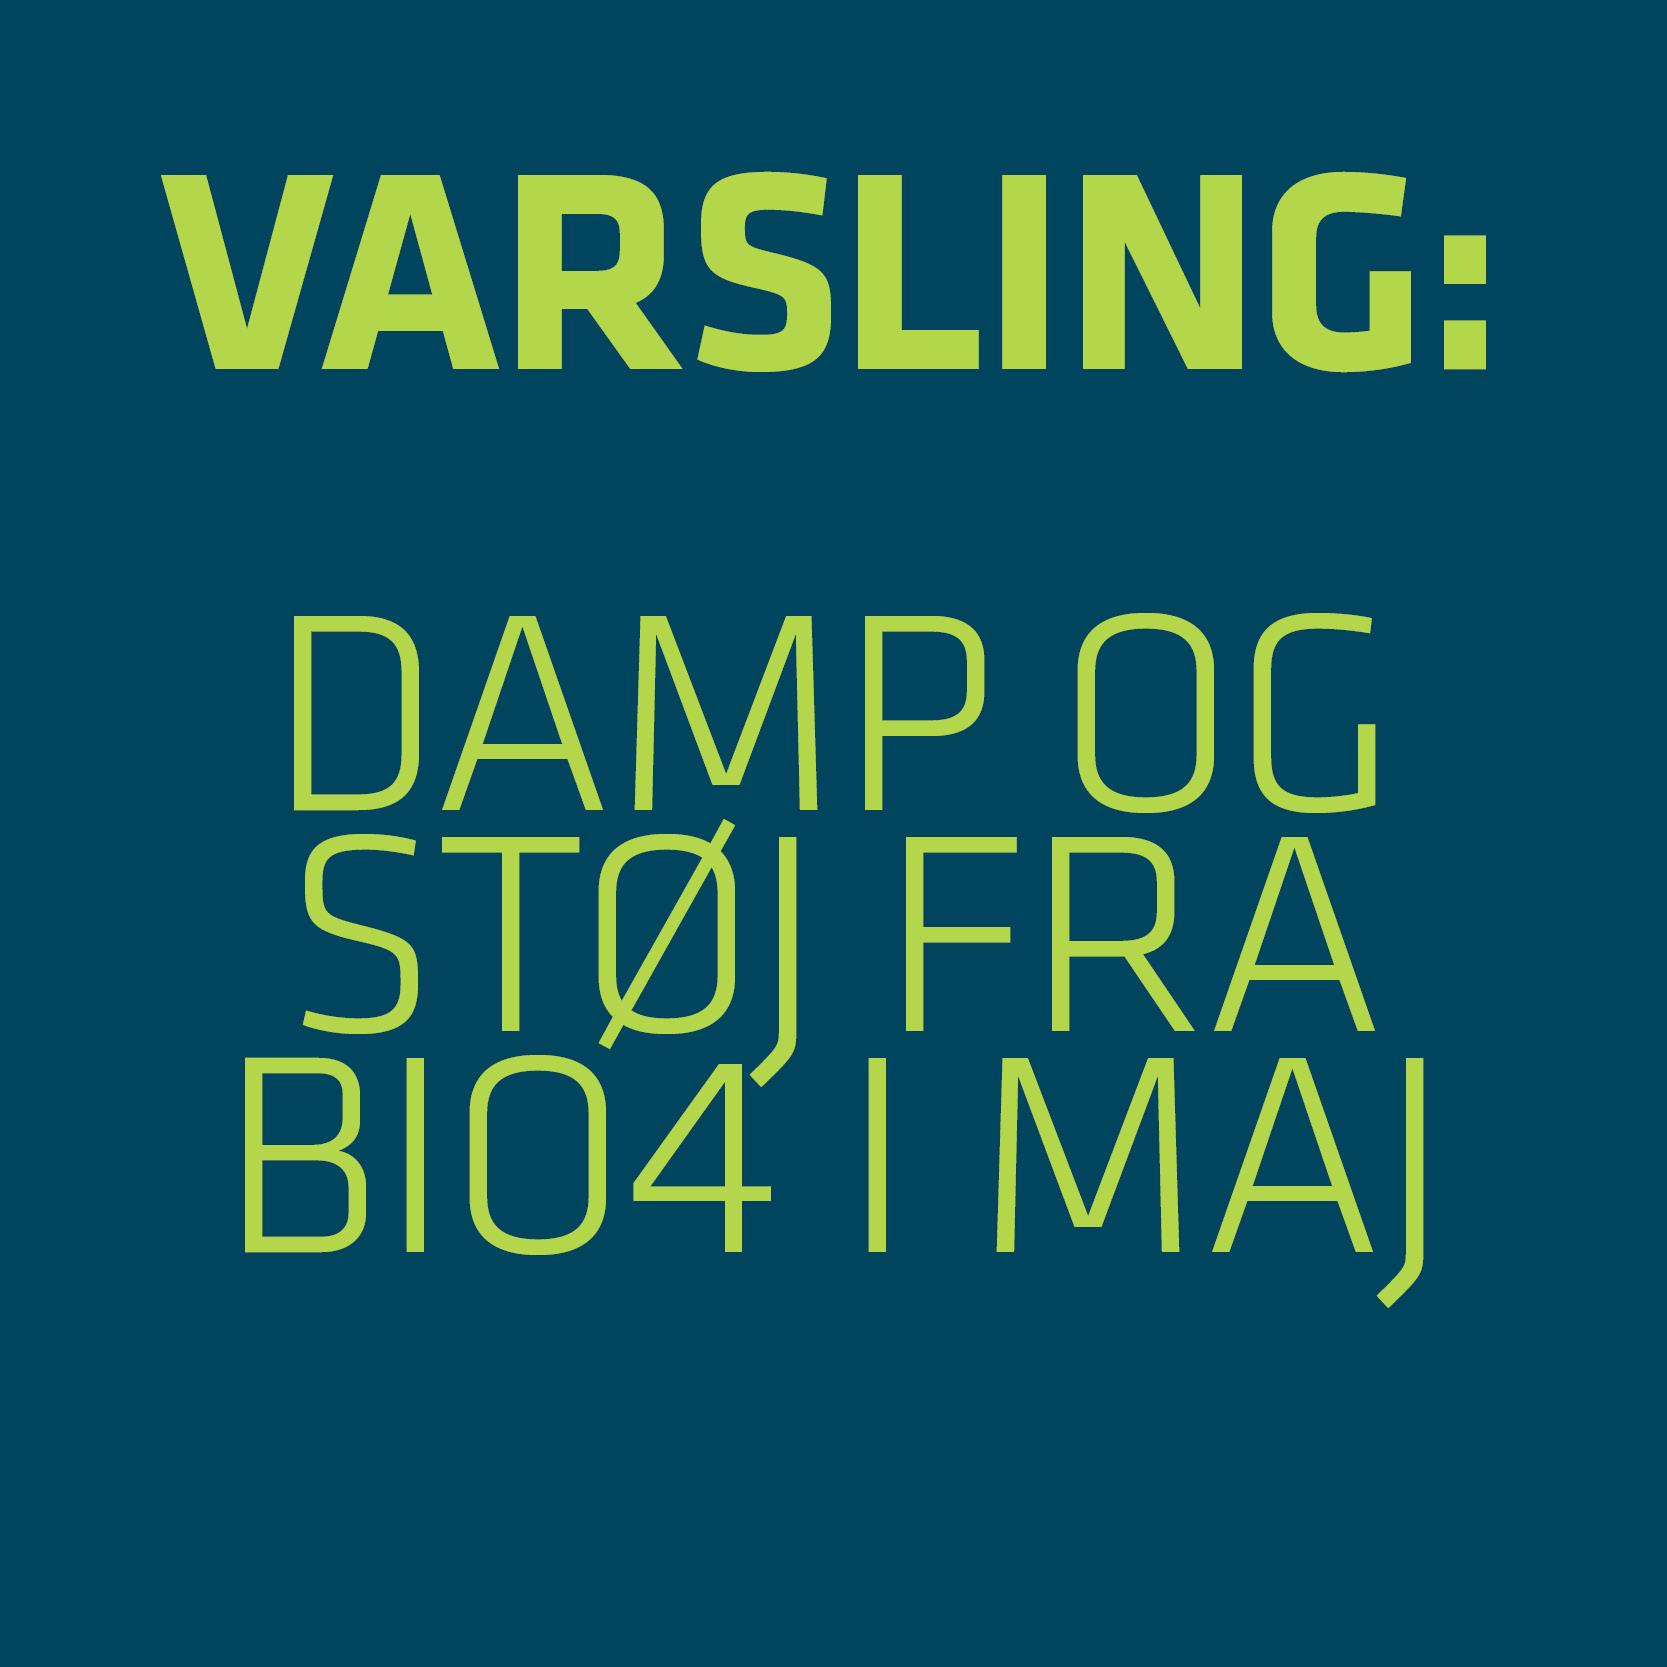 Varsling BIO4